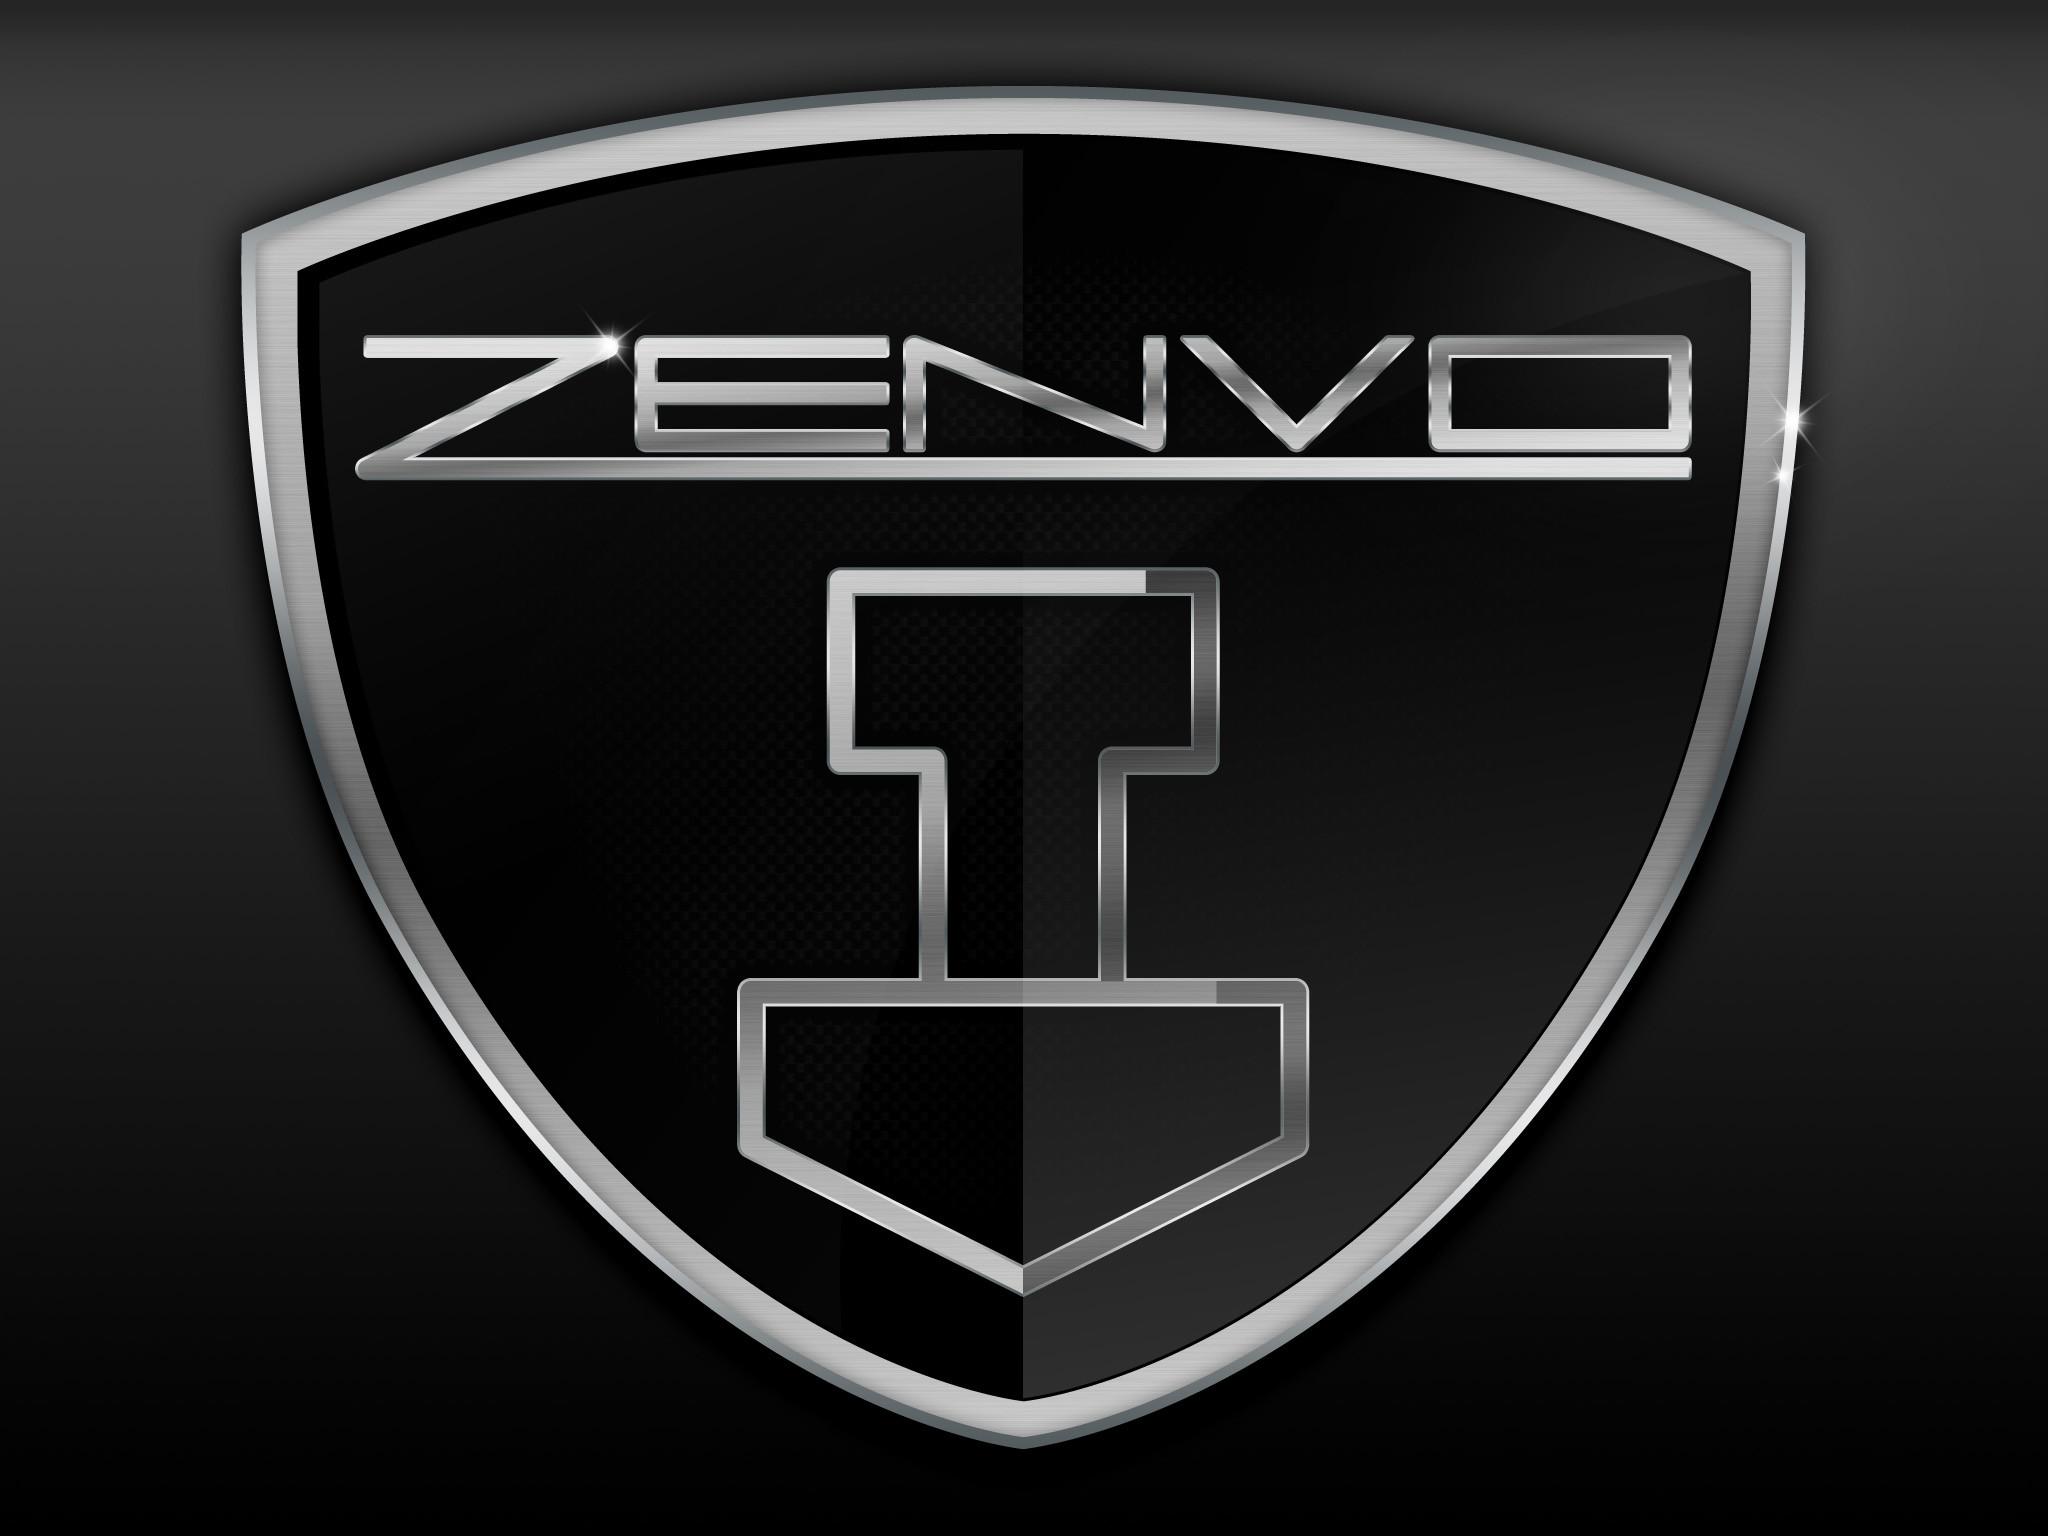 subaru logo black. 1920x1080 2017 subaru brz picture logo black